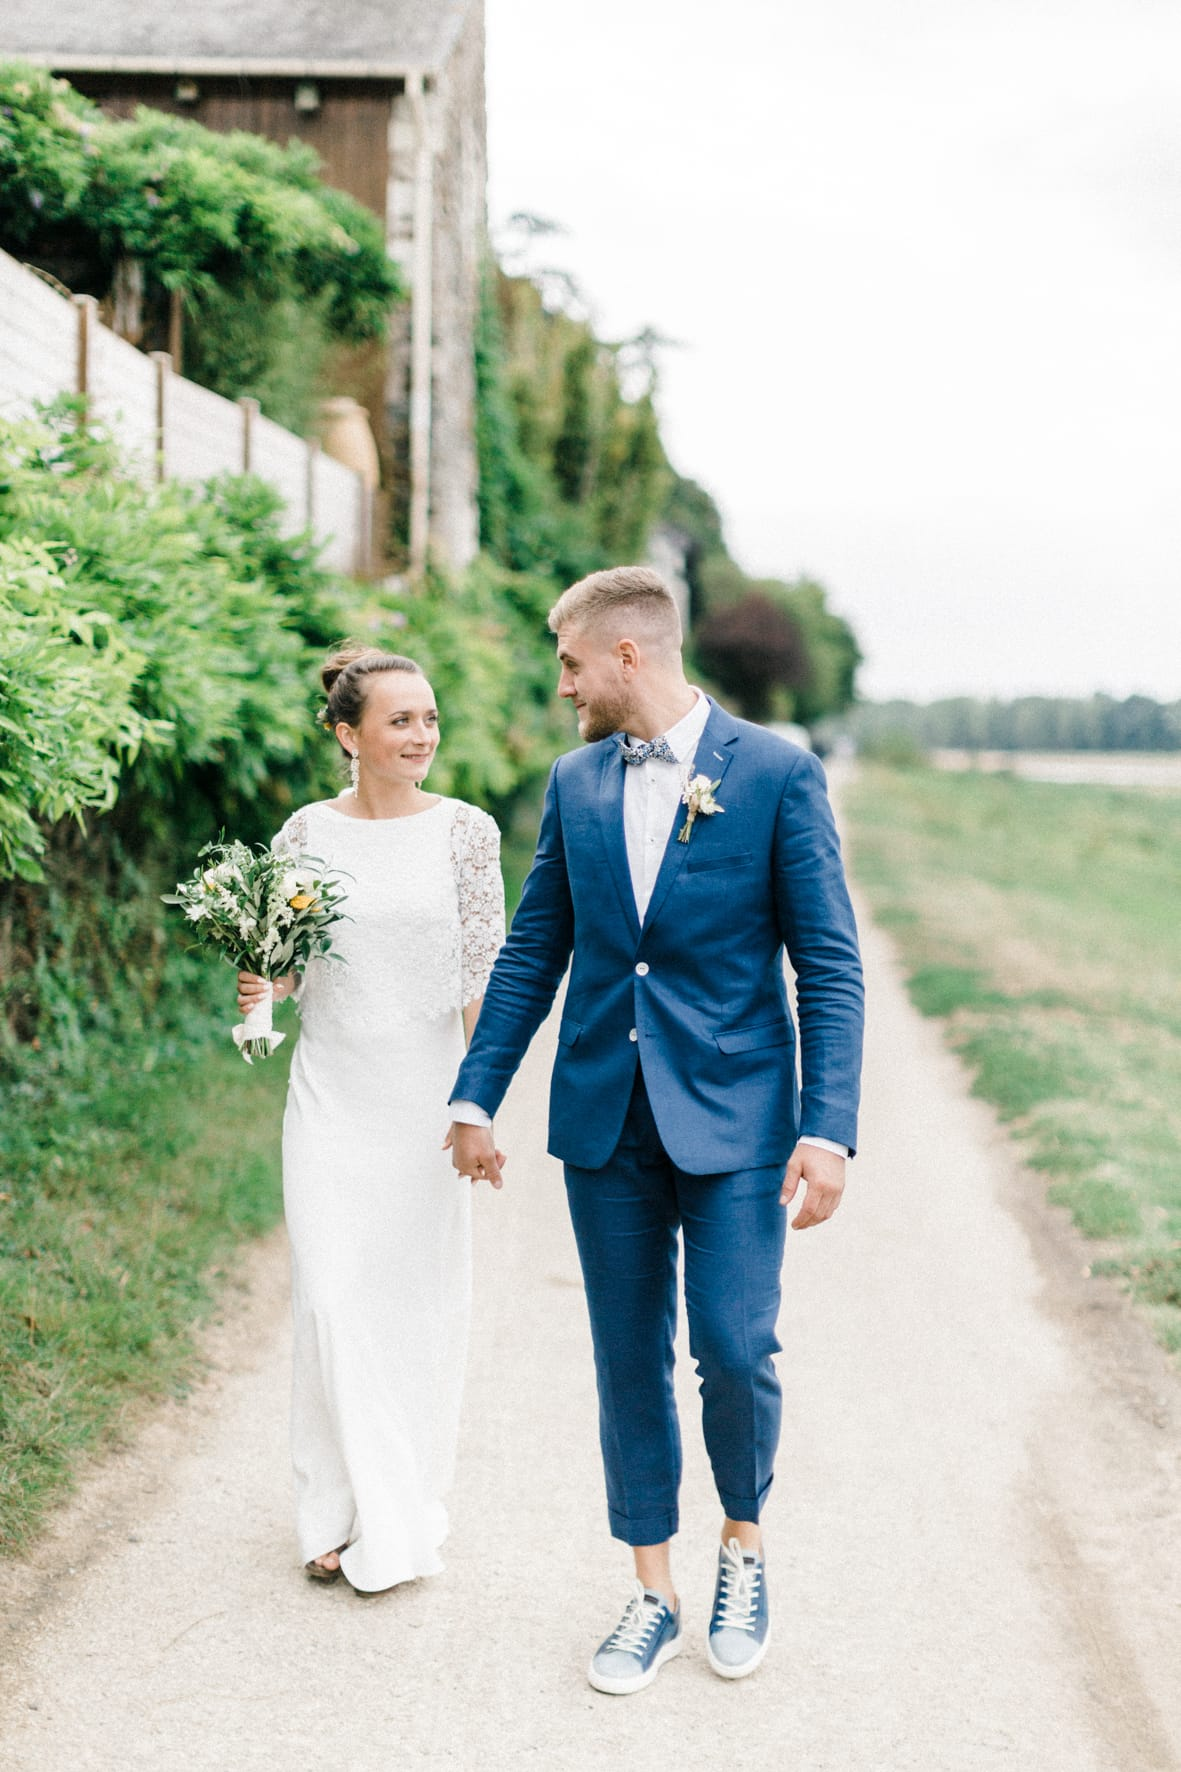 0022-mariage-211-obonheurdesdames-decoration-mariage-location